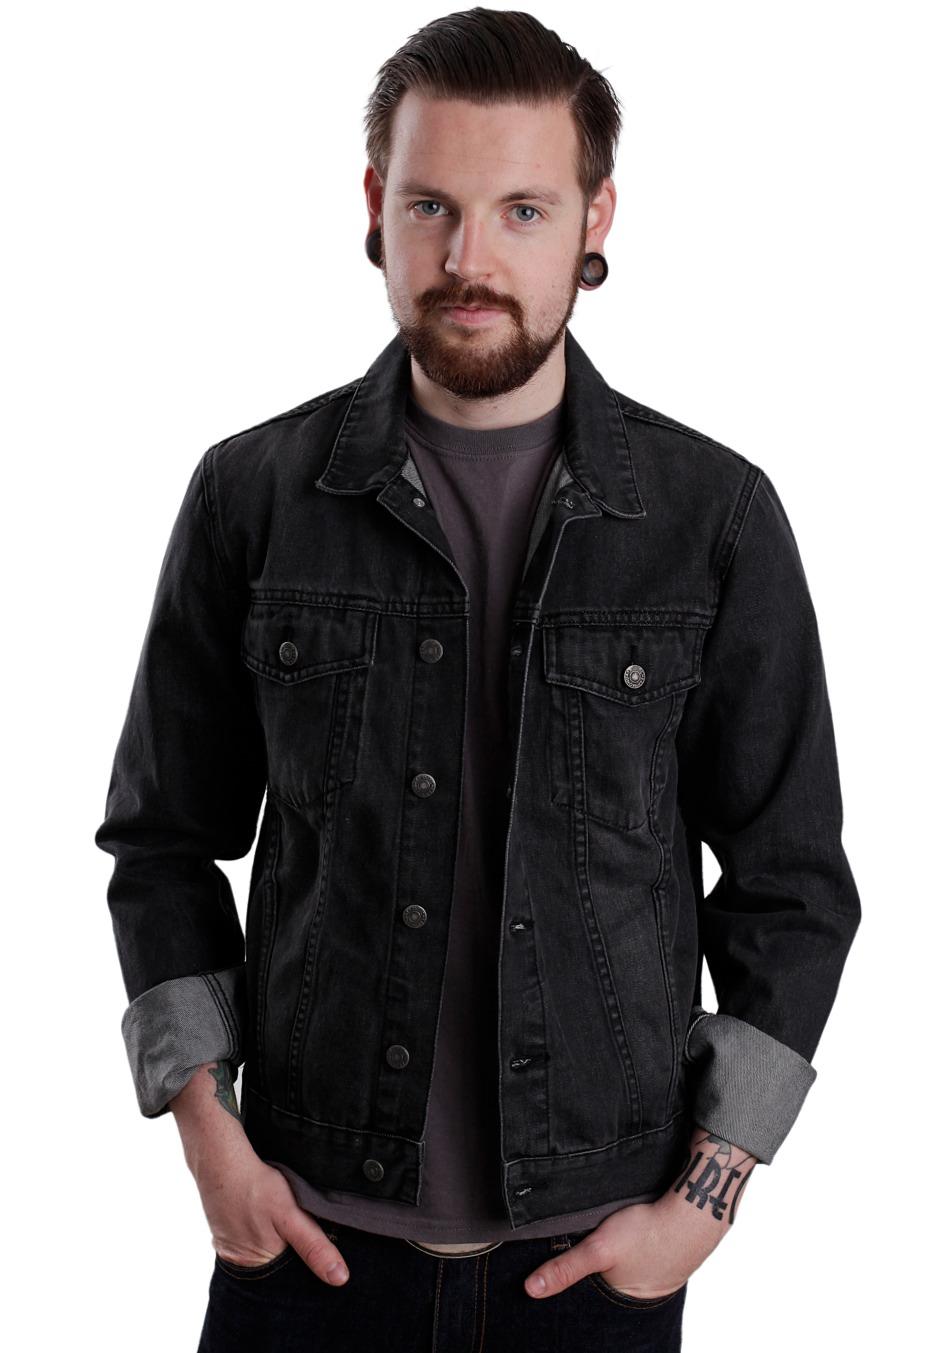 9a2b00deee90 Cheap Monday - Staple Black Heavy Stone - Jeans Jacket - Impericon.com  Worldwide